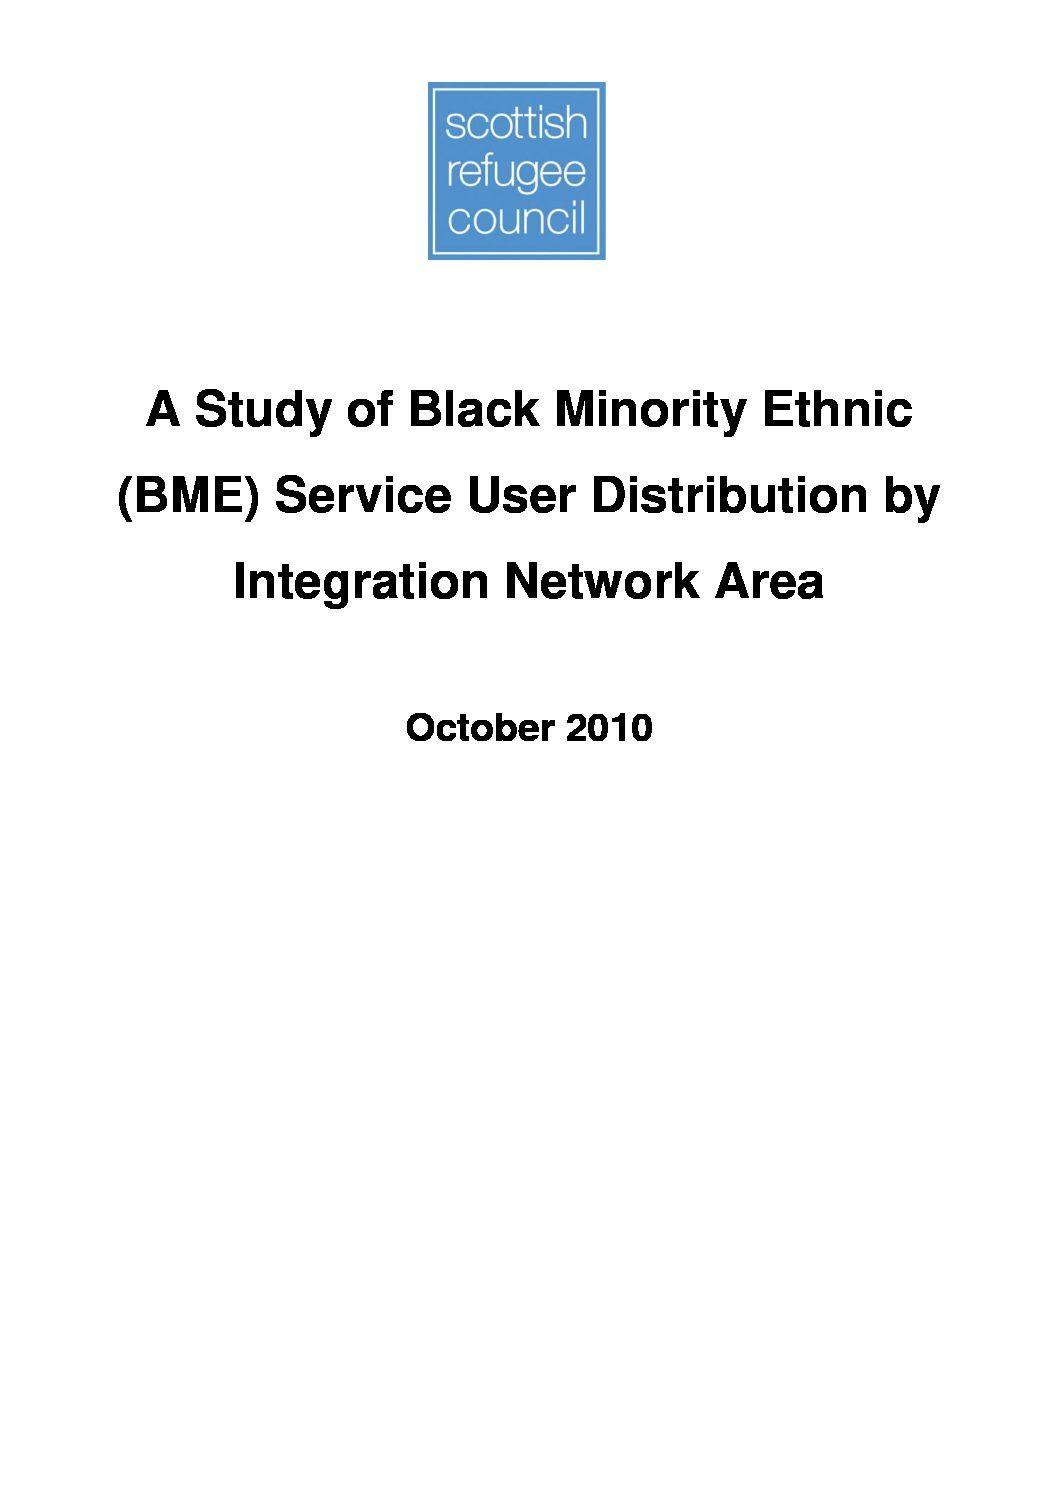 A-study-of-Black-Minority-Ethnic-BME-service-user-distribution-pdf